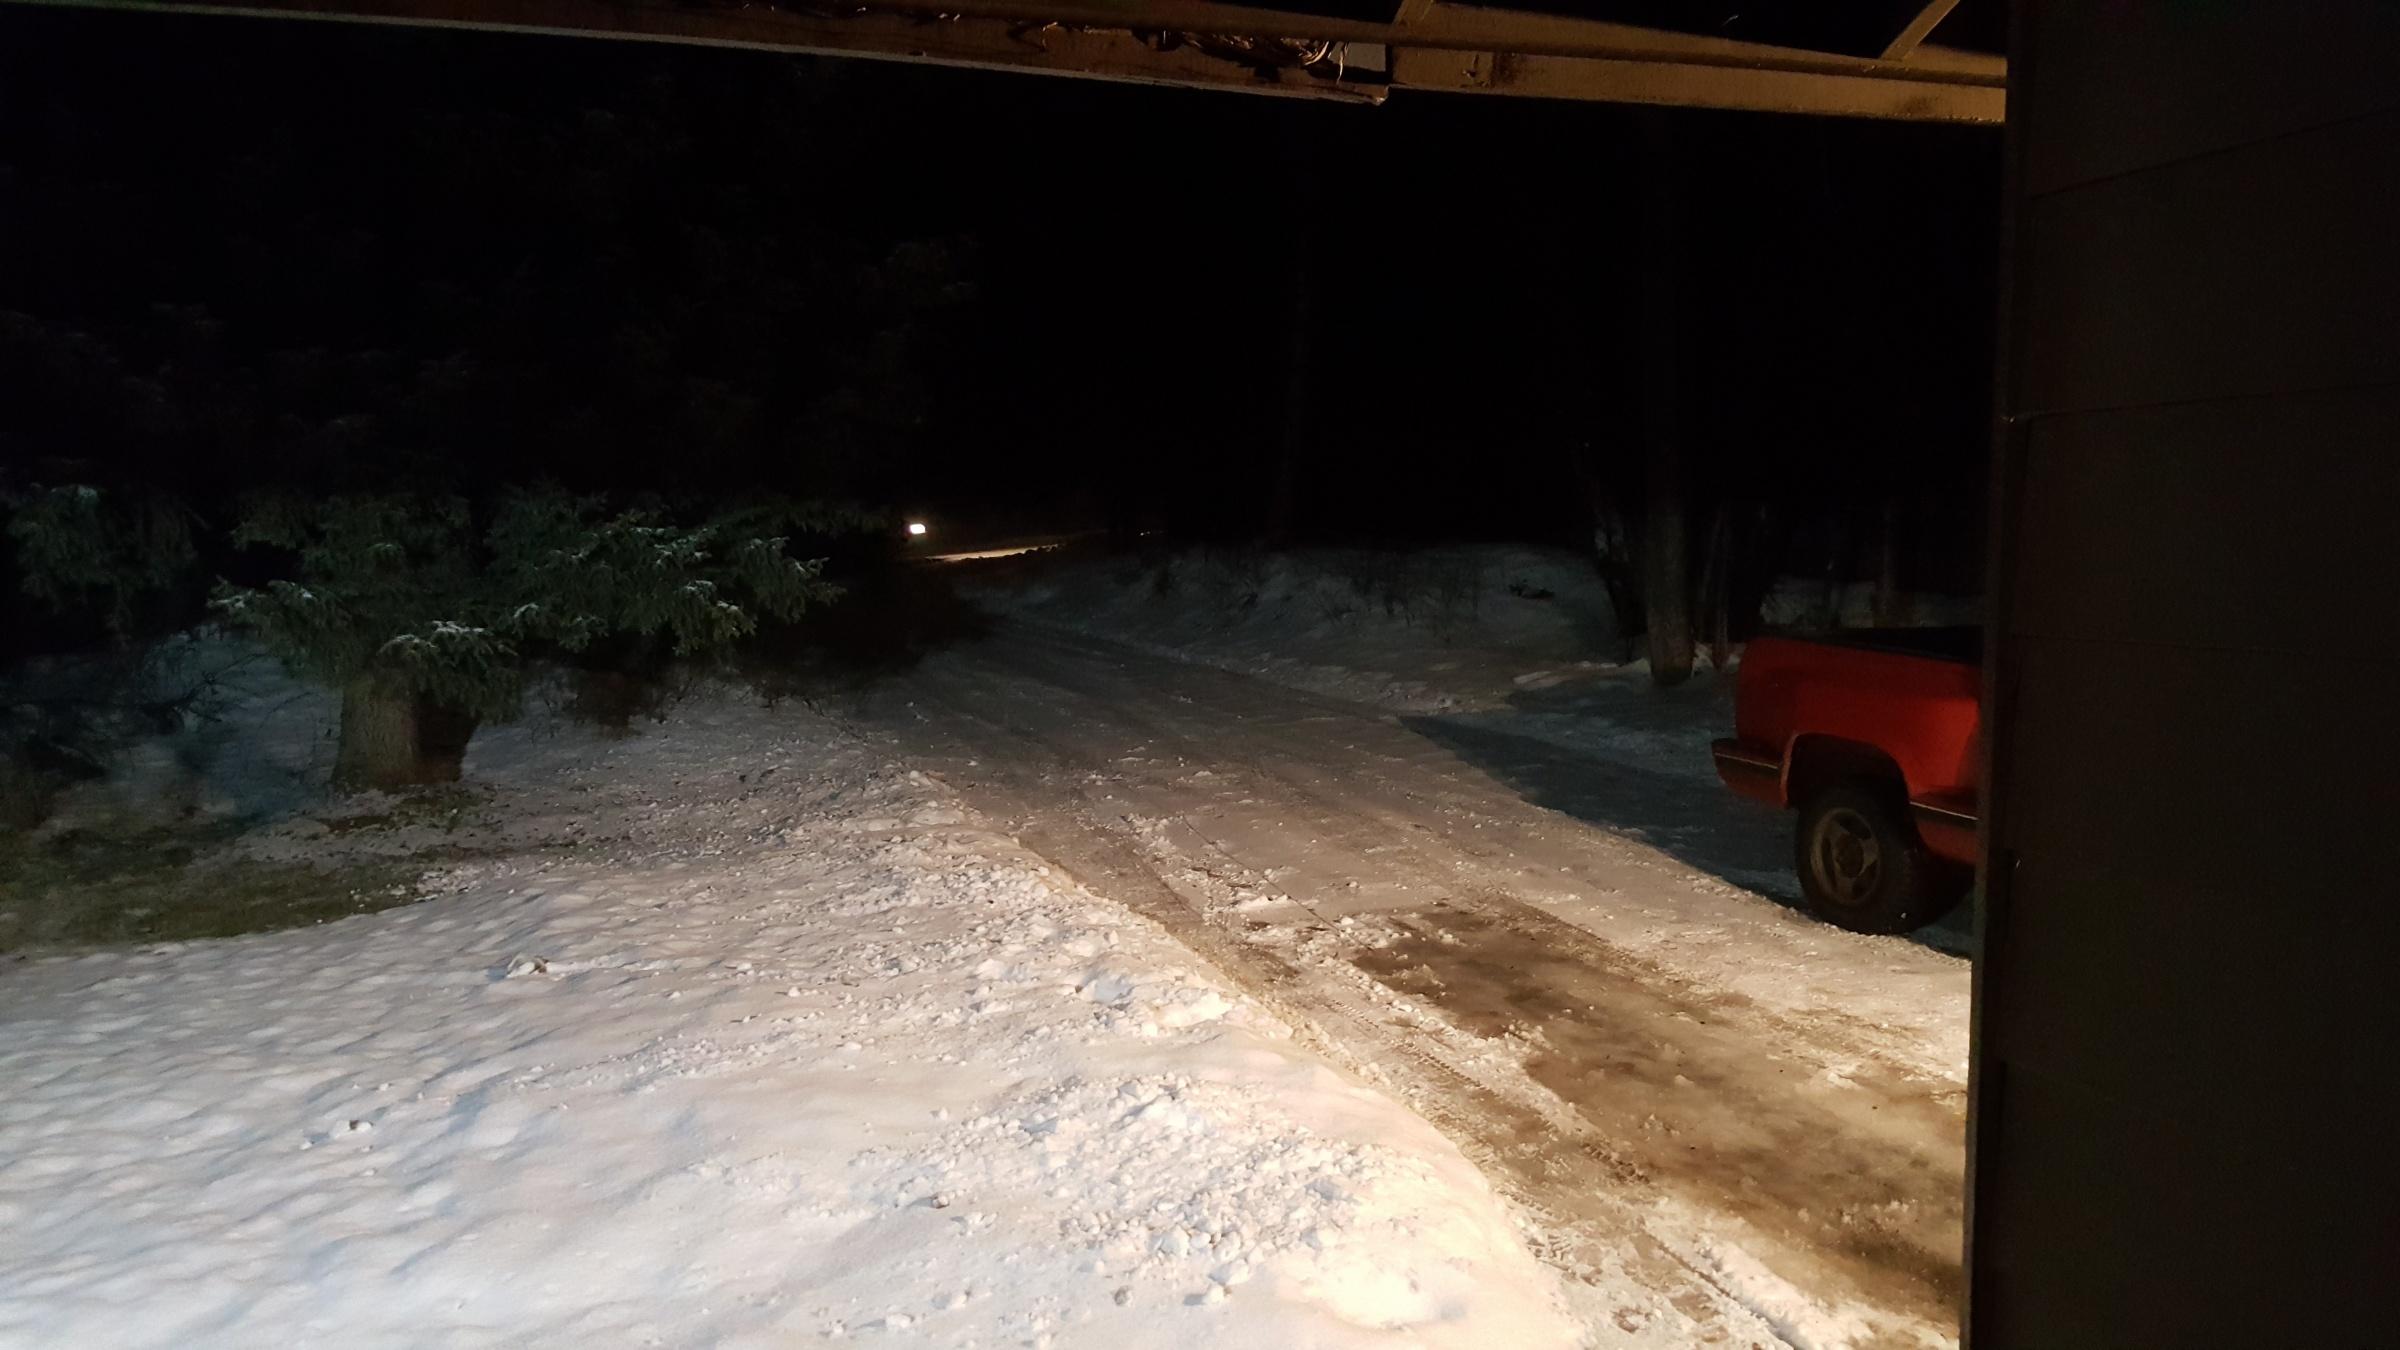 Best way to light very long driveways-20190131_035329.jpg